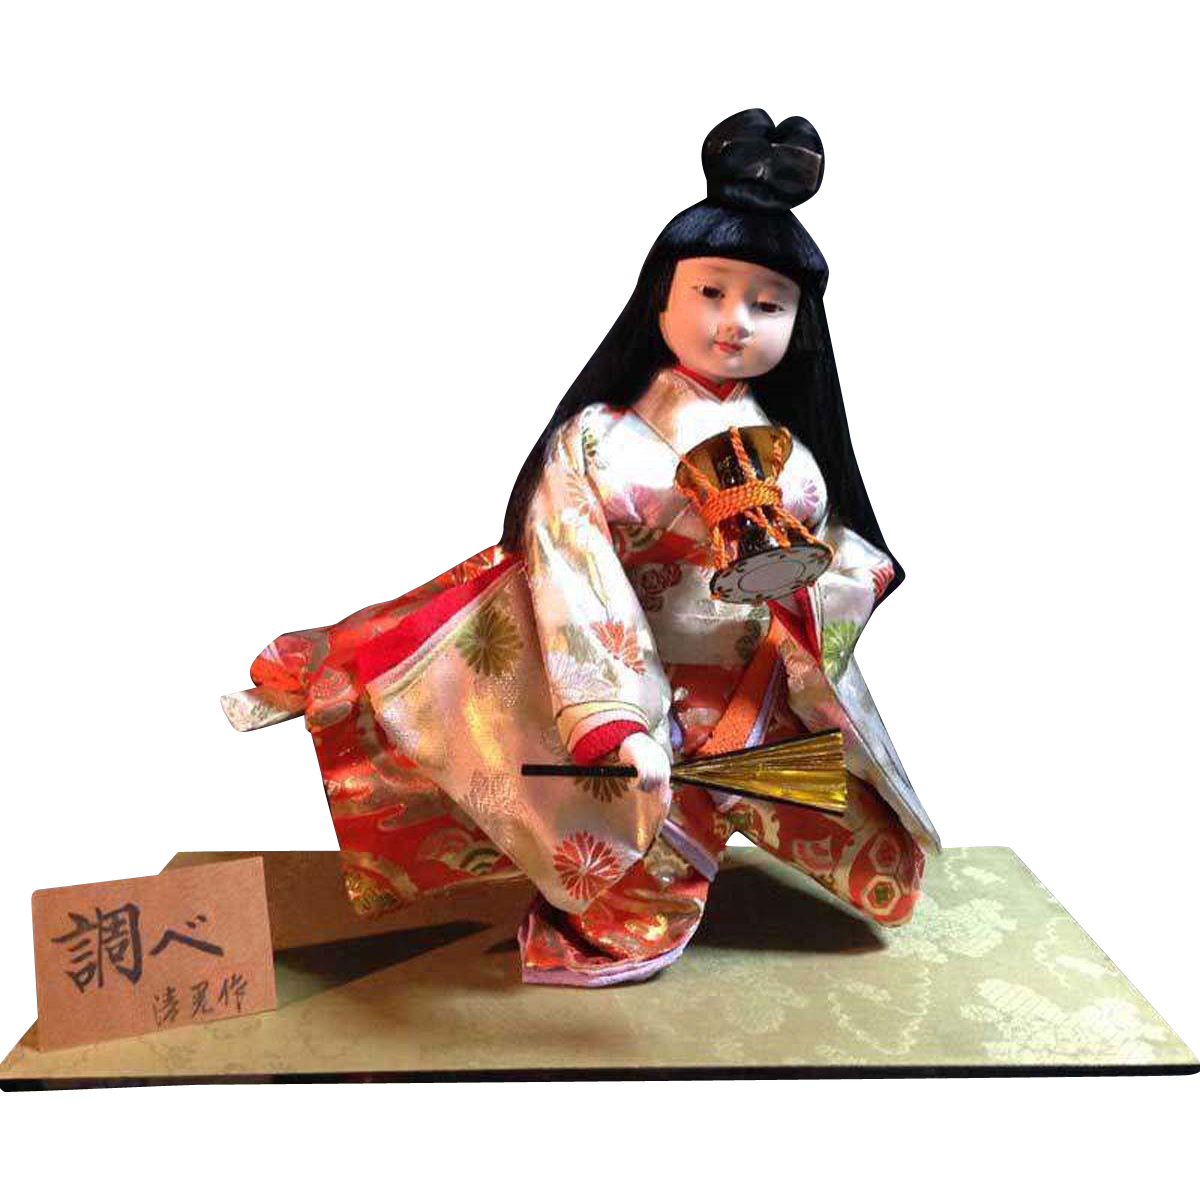 Japanese Vintage Ichimatsu Doll 一松人形 of Gofun Famous Designer Seikoh 清晃